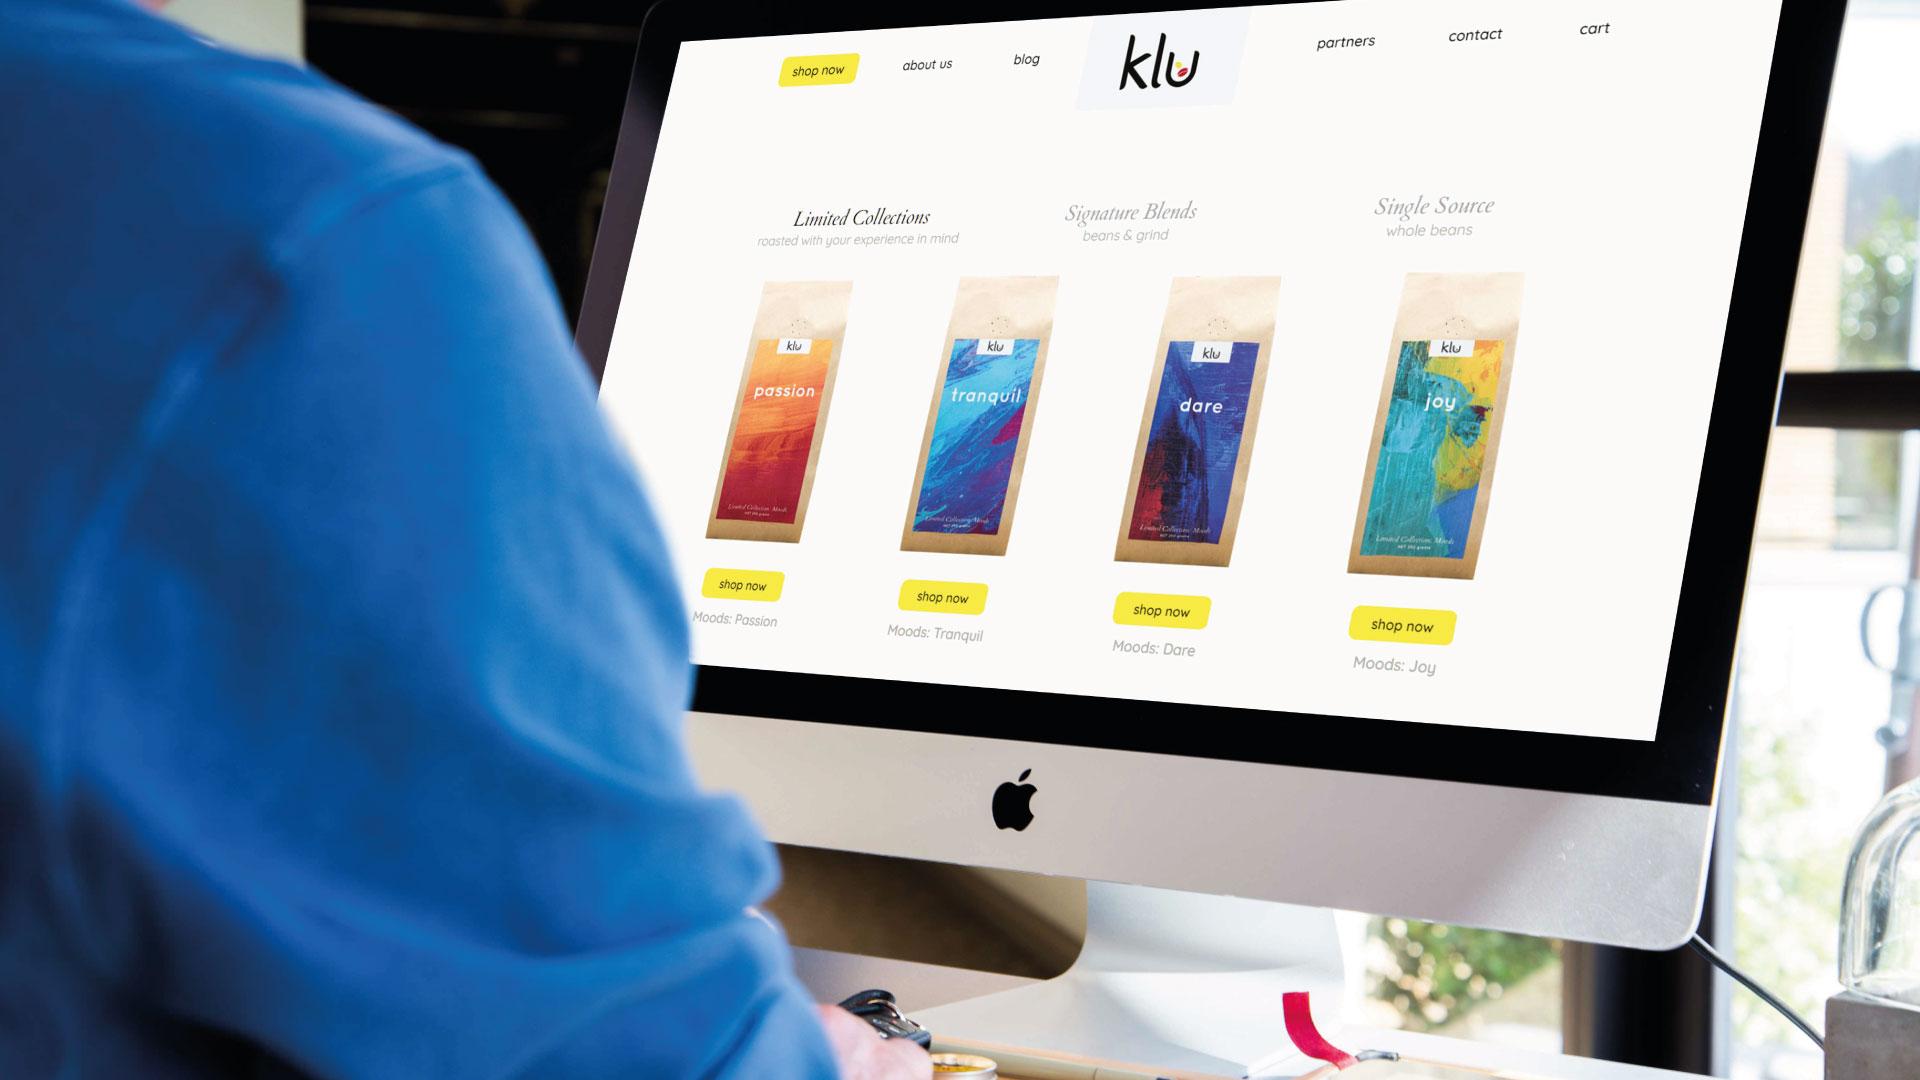 Klu Layout on iMac